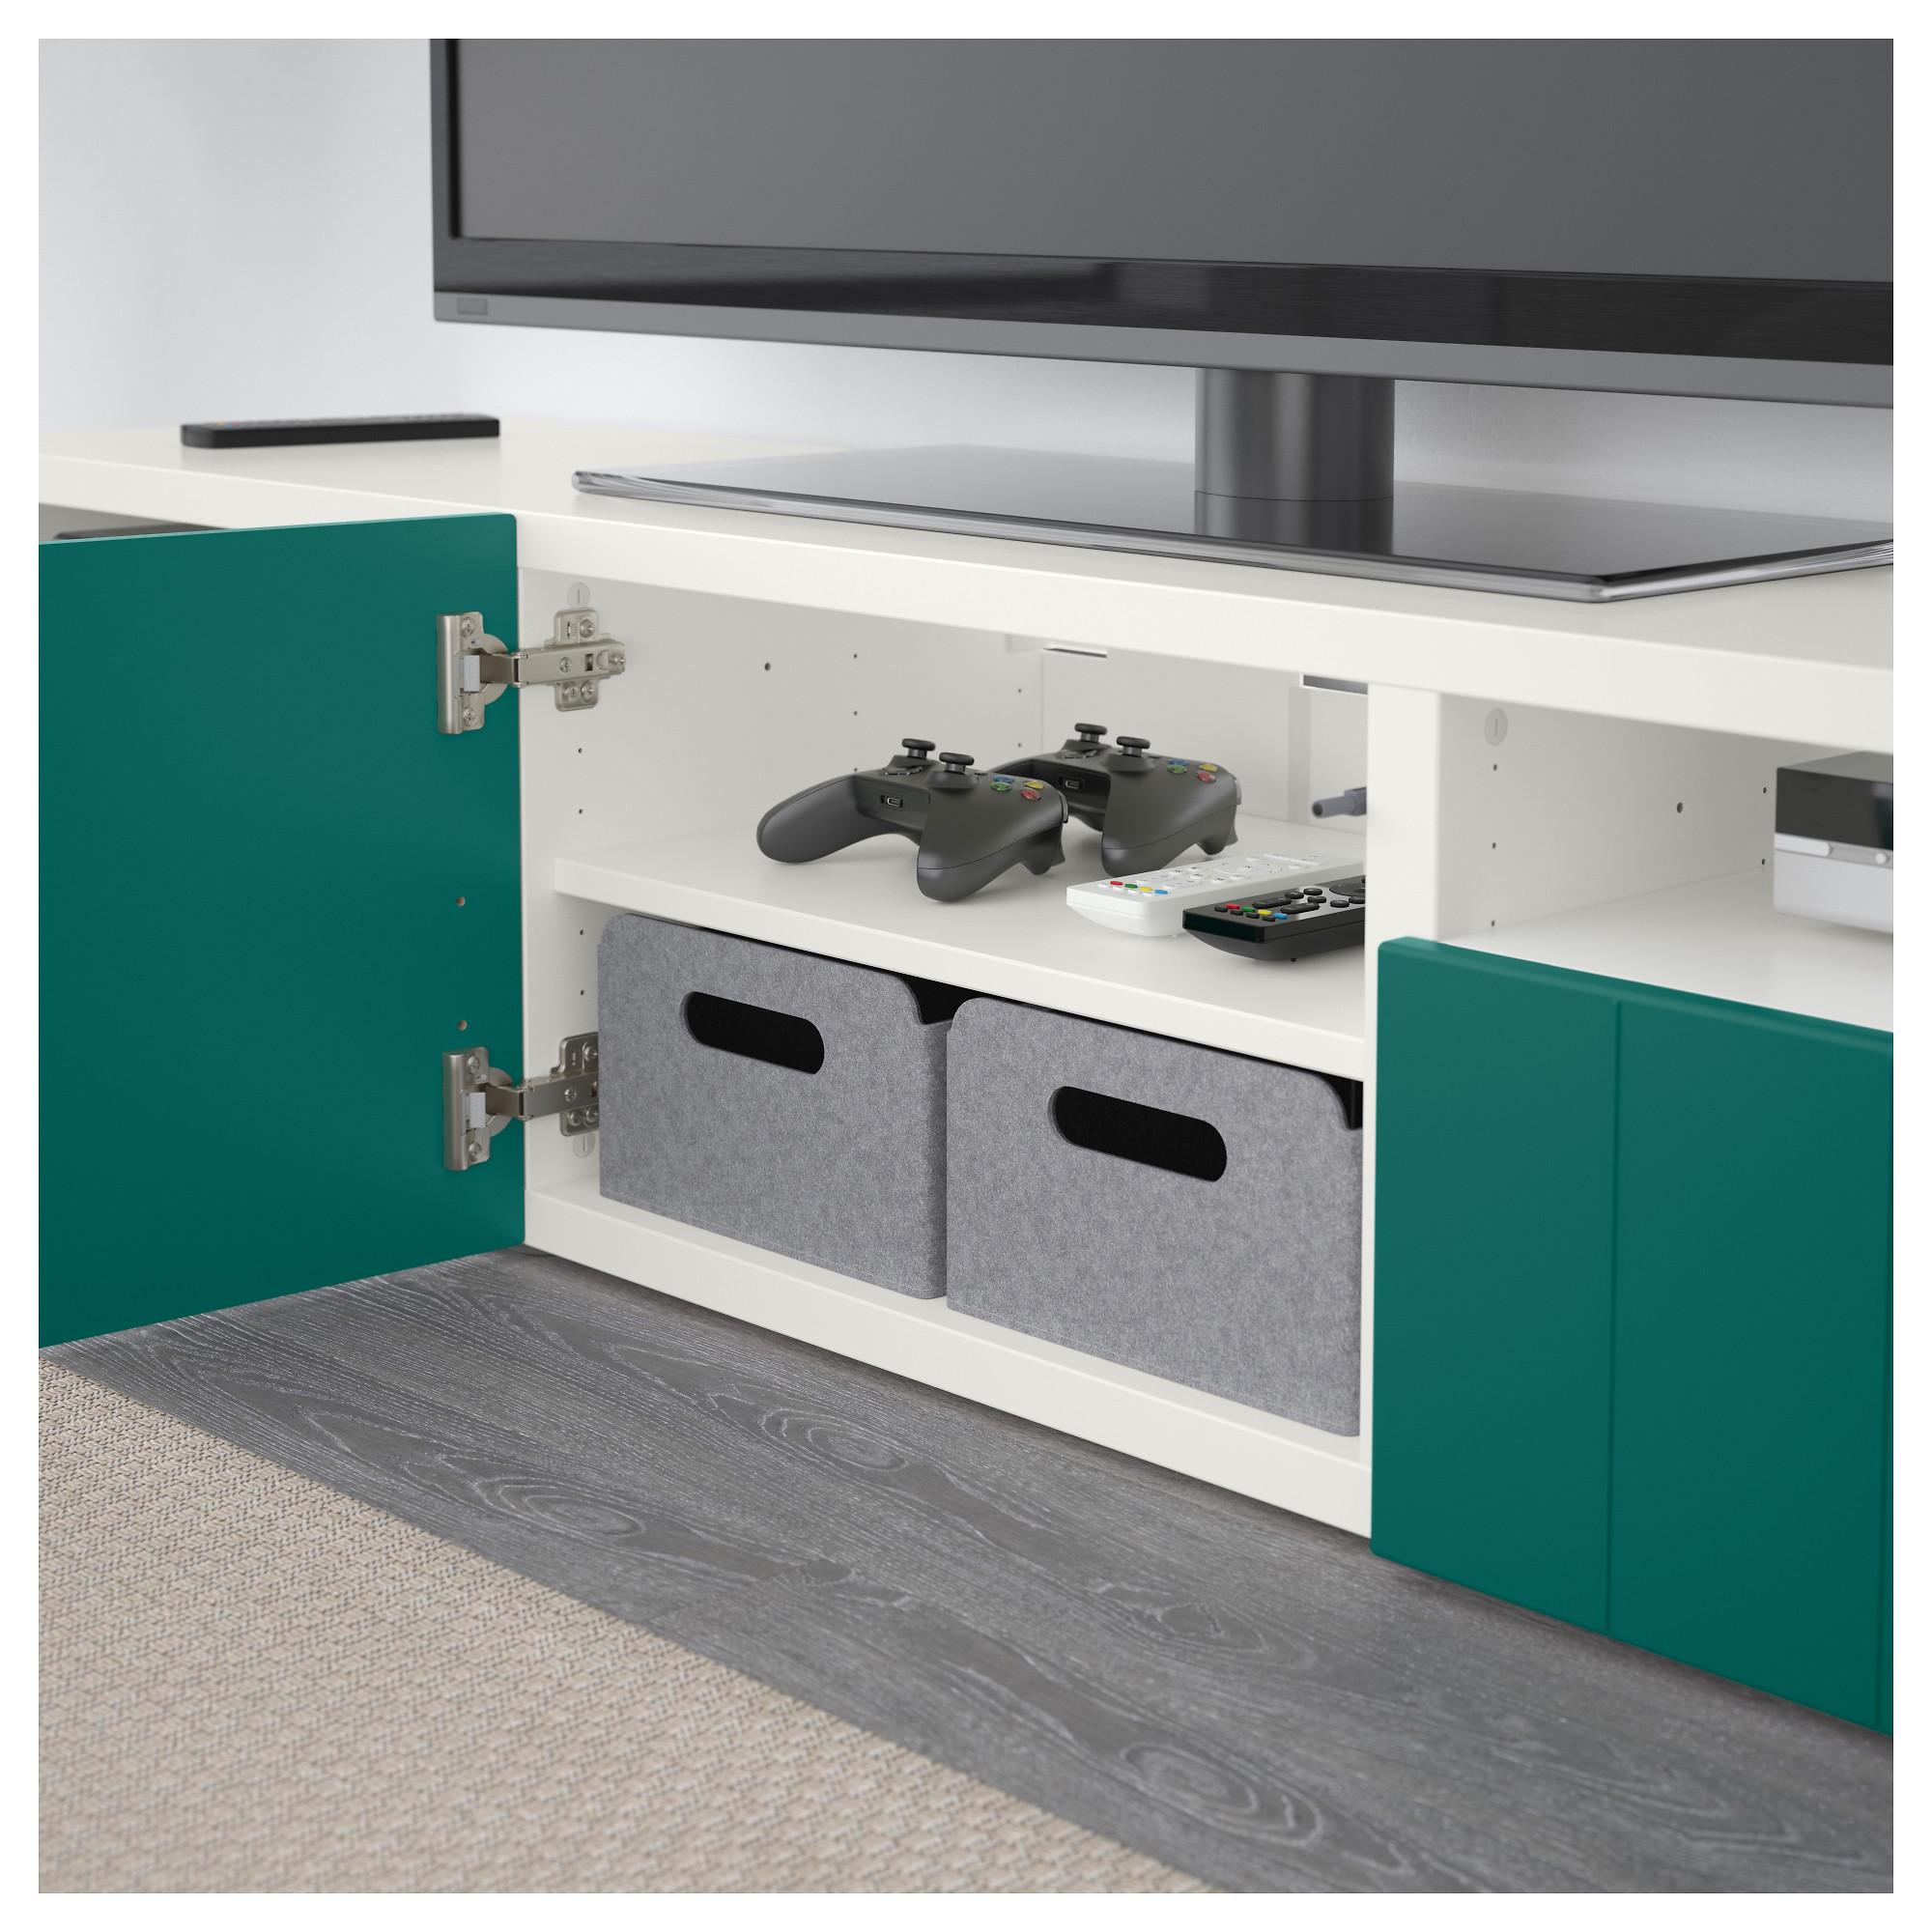 Тумба под ТВ с ящиками и дверцей БЕСТО сине-зеленый артикуль № 792.758.31 в наличии. Онлайн магазин IKEA РБ. Быстрая доставка и монтаж.